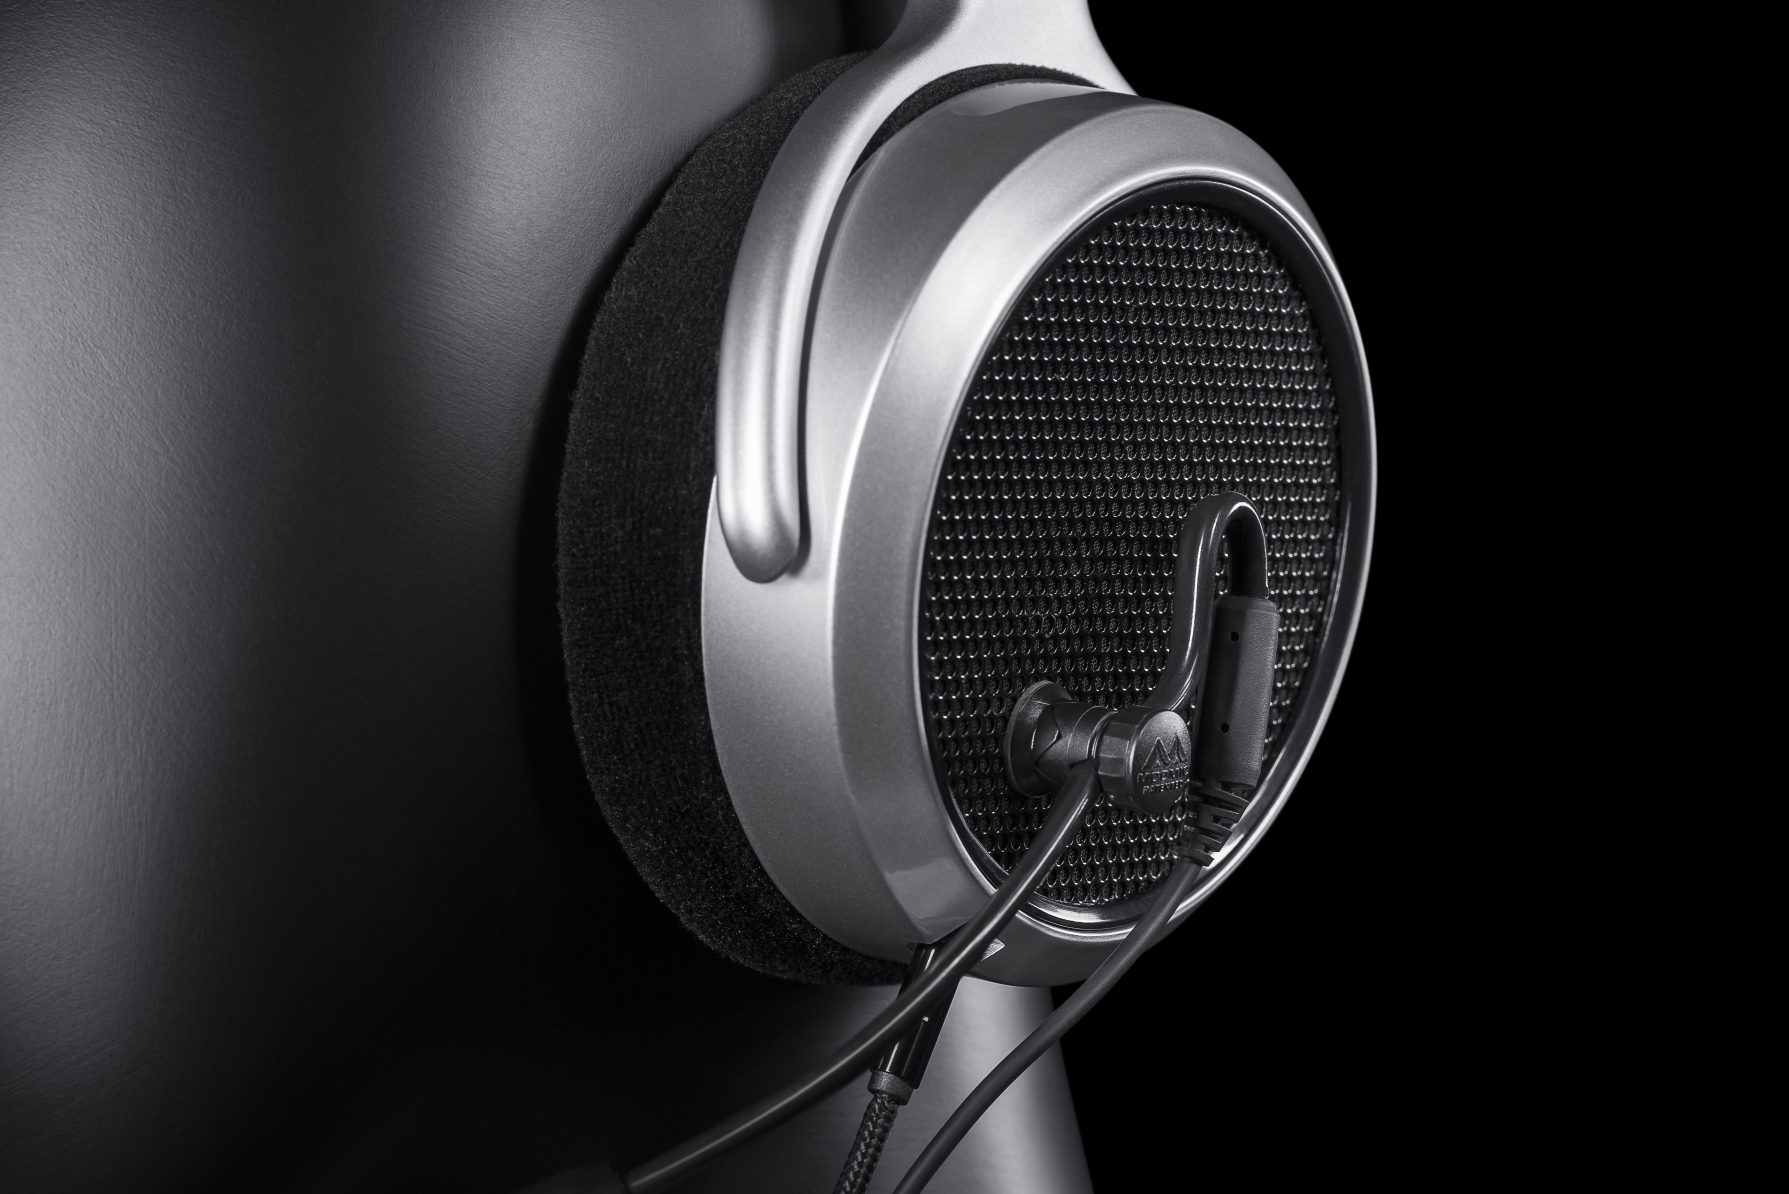 modmic-5-on-open-back-headphones